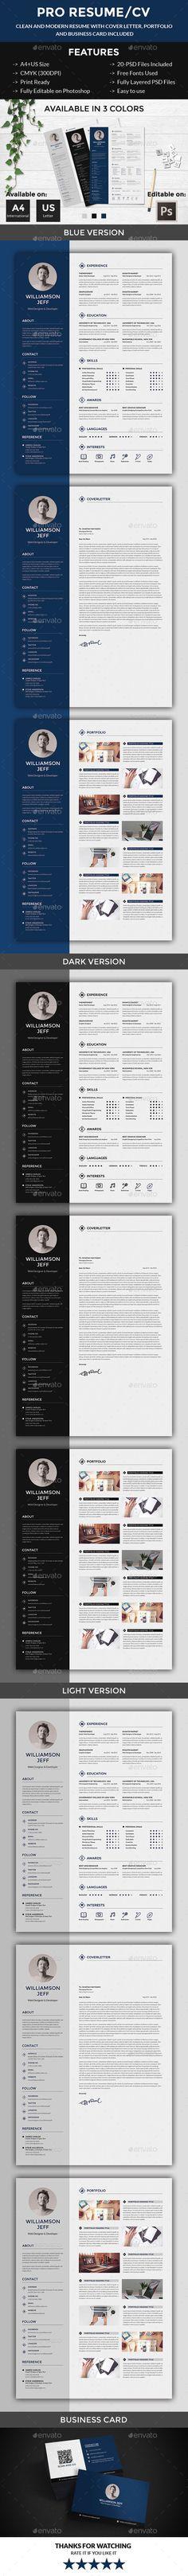 Pro Resume/CV